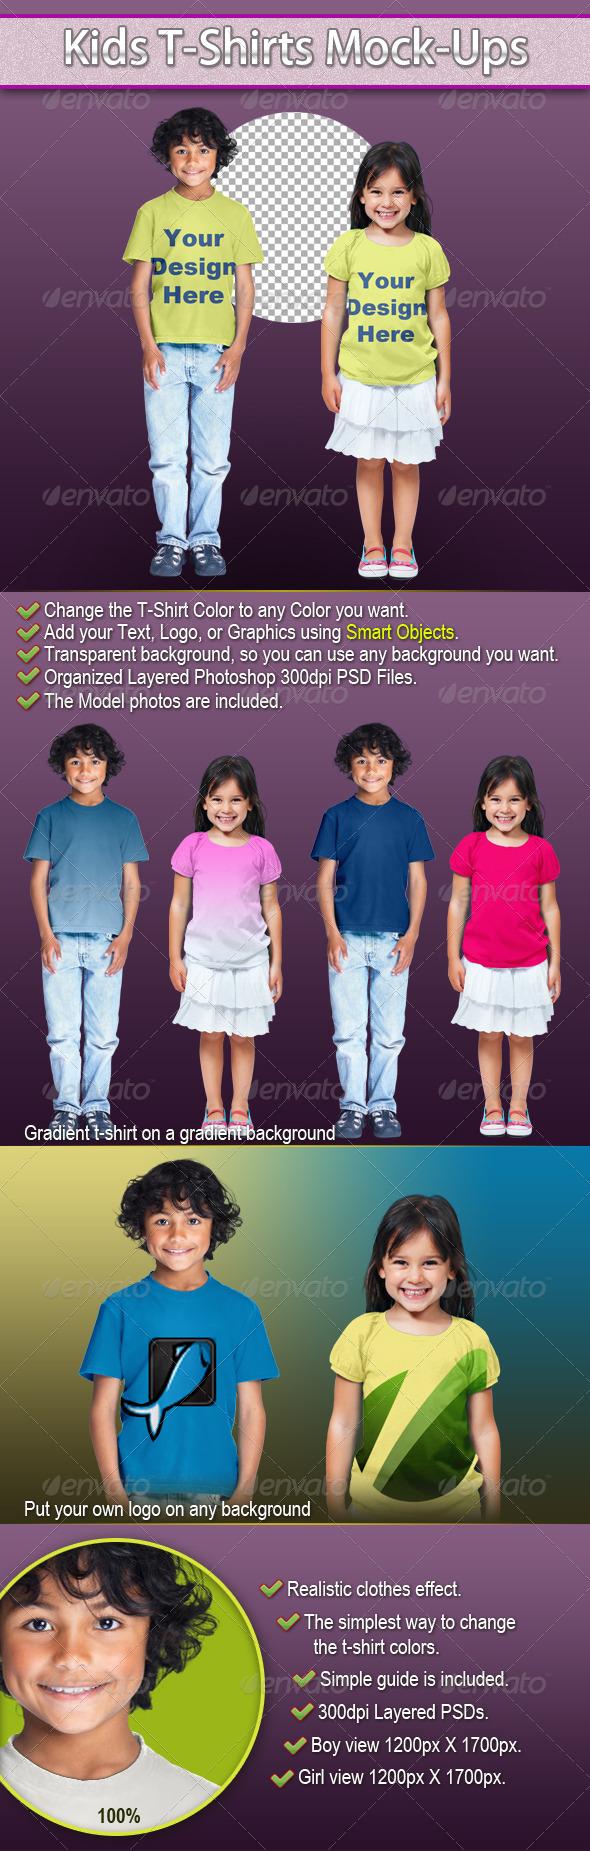 GraphicRiver Kids T-Shirts Mock-Ups 3031380